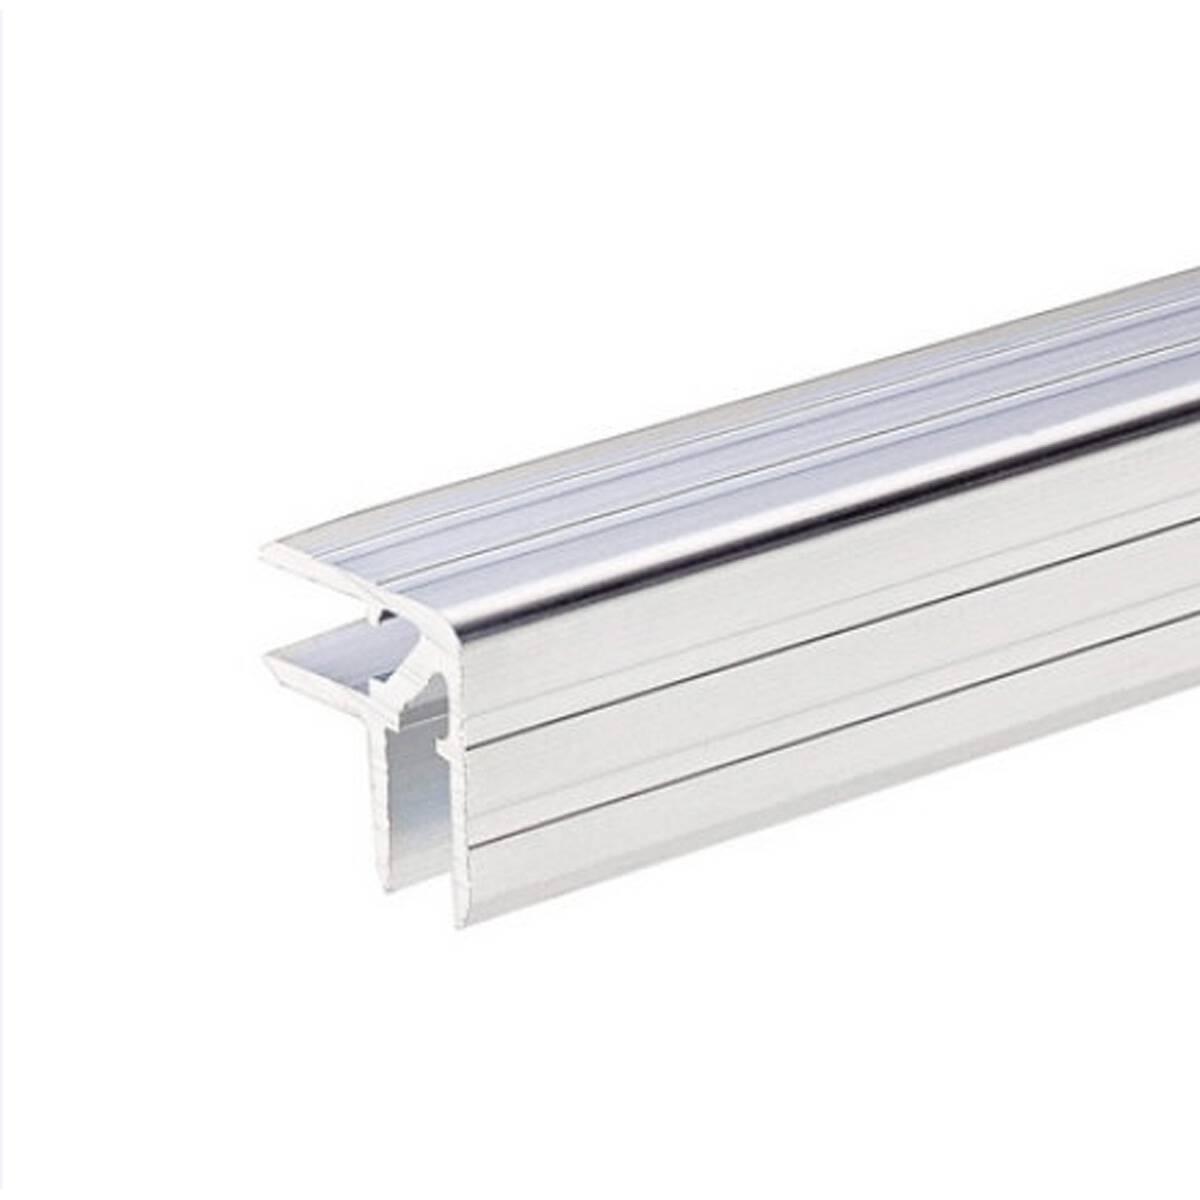 adam hall 6129 aluminium casemaker 7 mm einschub. Black Bedroom Furniture Sets. Home Design Ideas